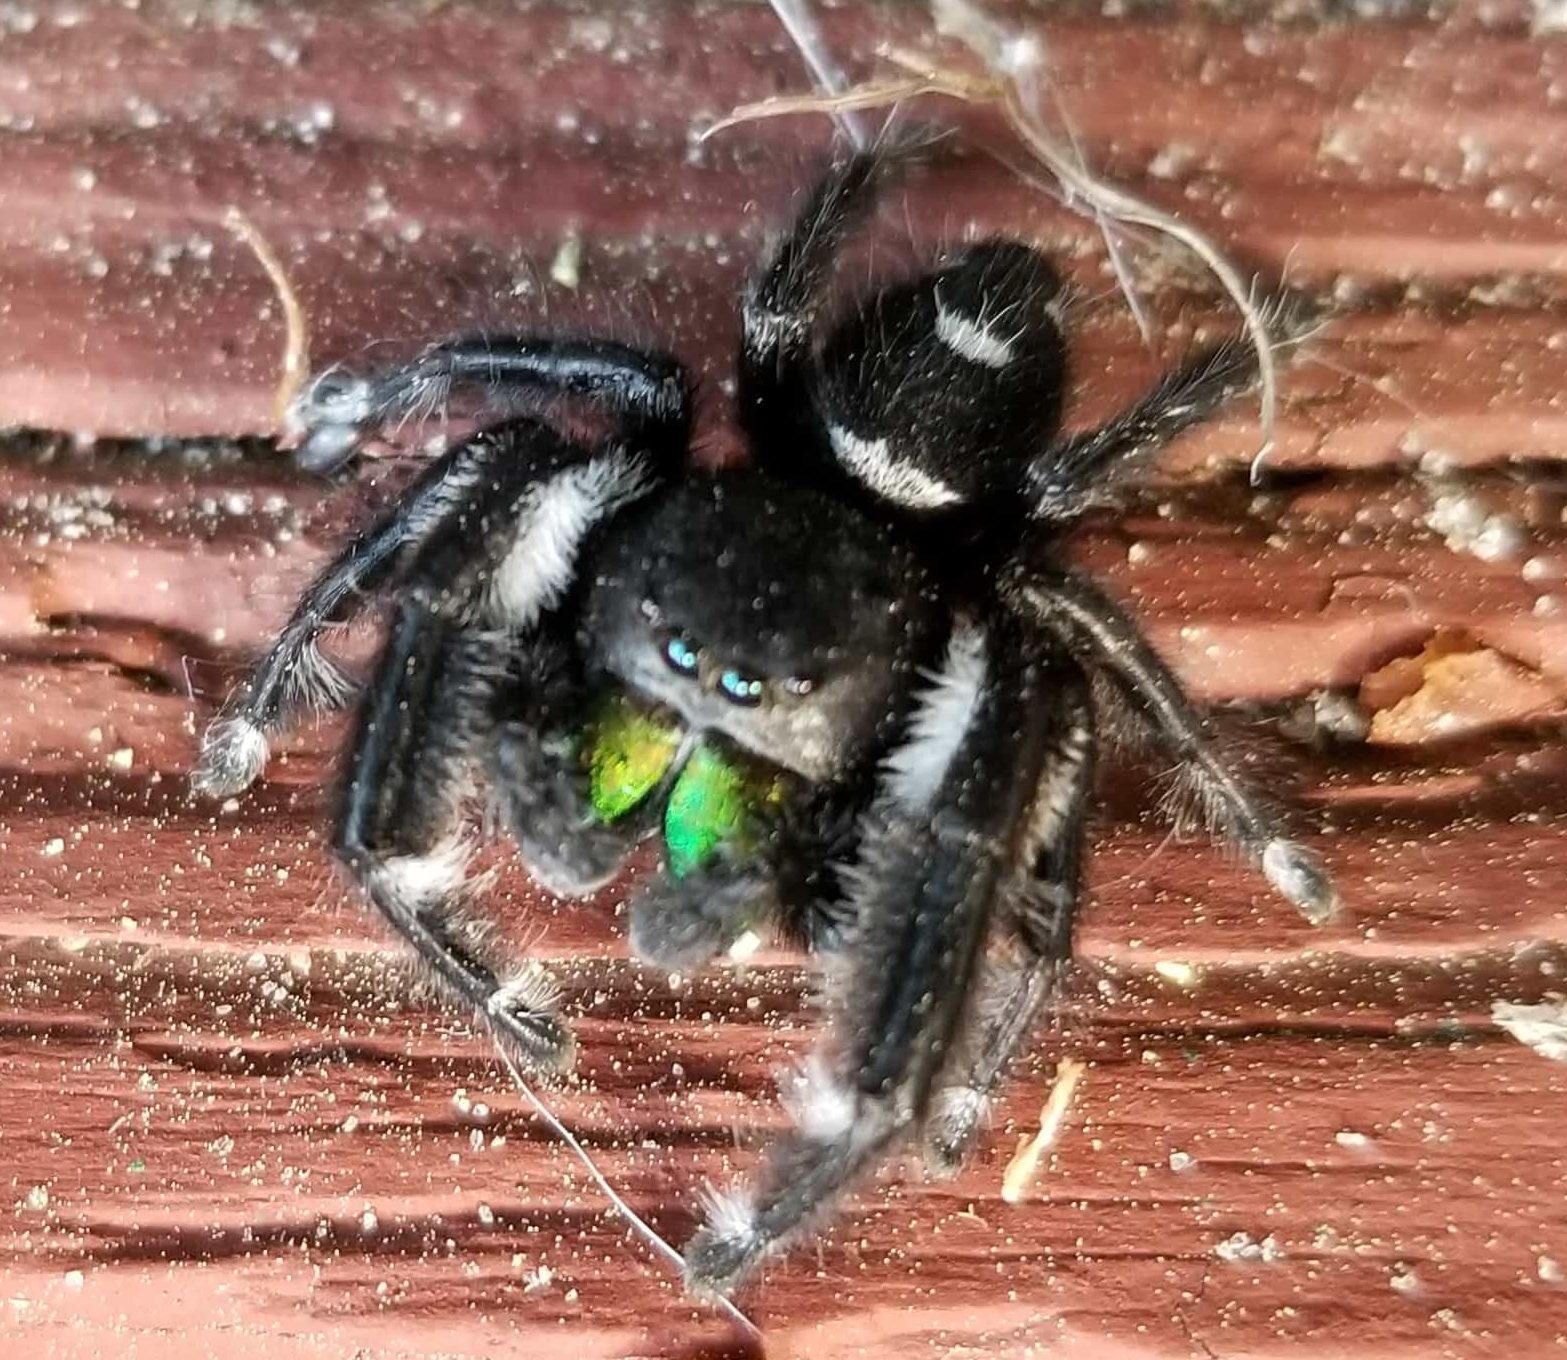 Picture of Phidippus regius (Regal Jumping Spider) - Male - Eyes,Ventral